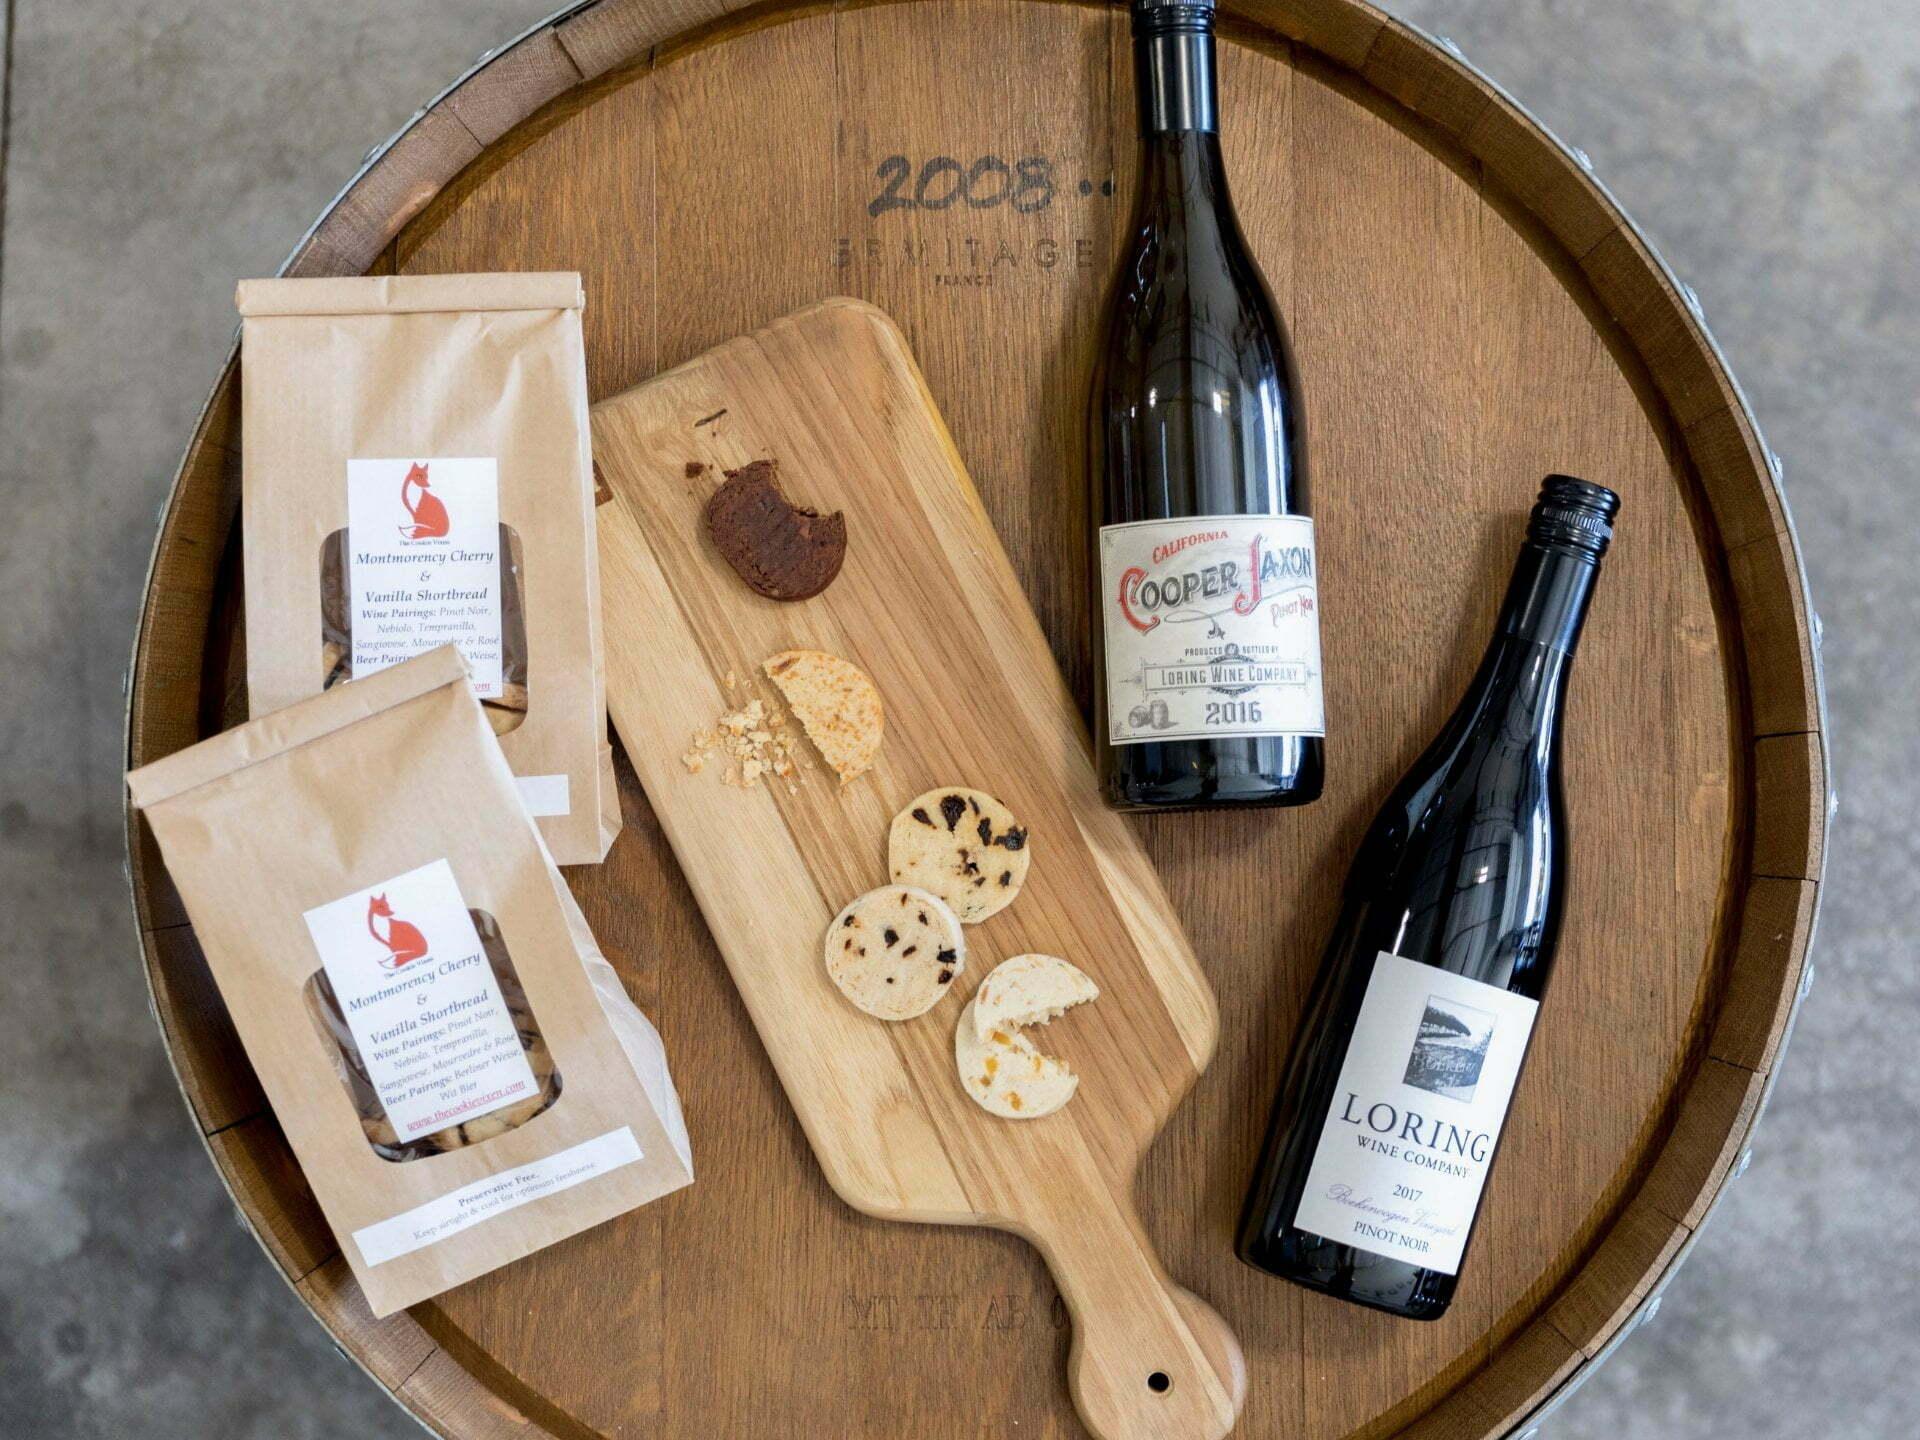 Loring Wine Company